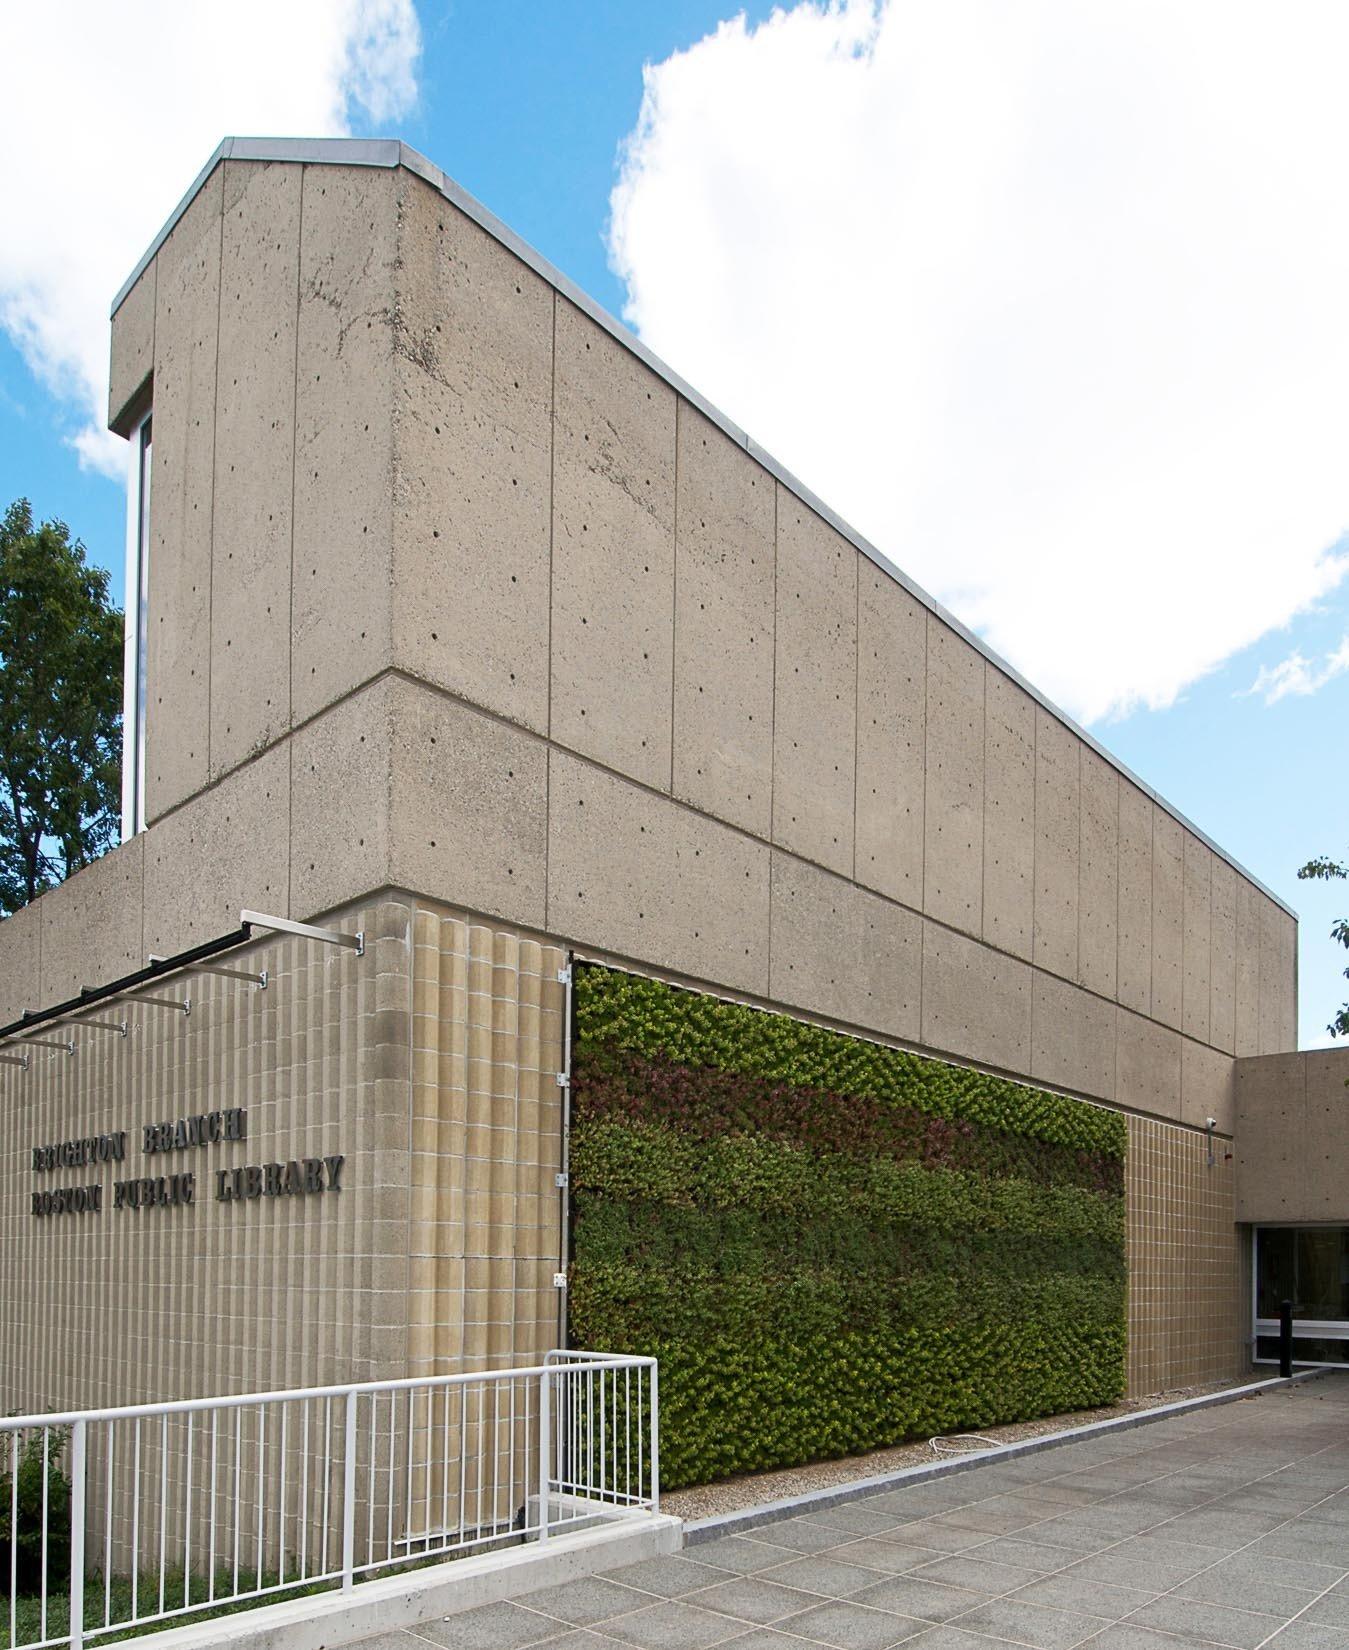 Boston Public Library, Brighton Branch, Green Wall